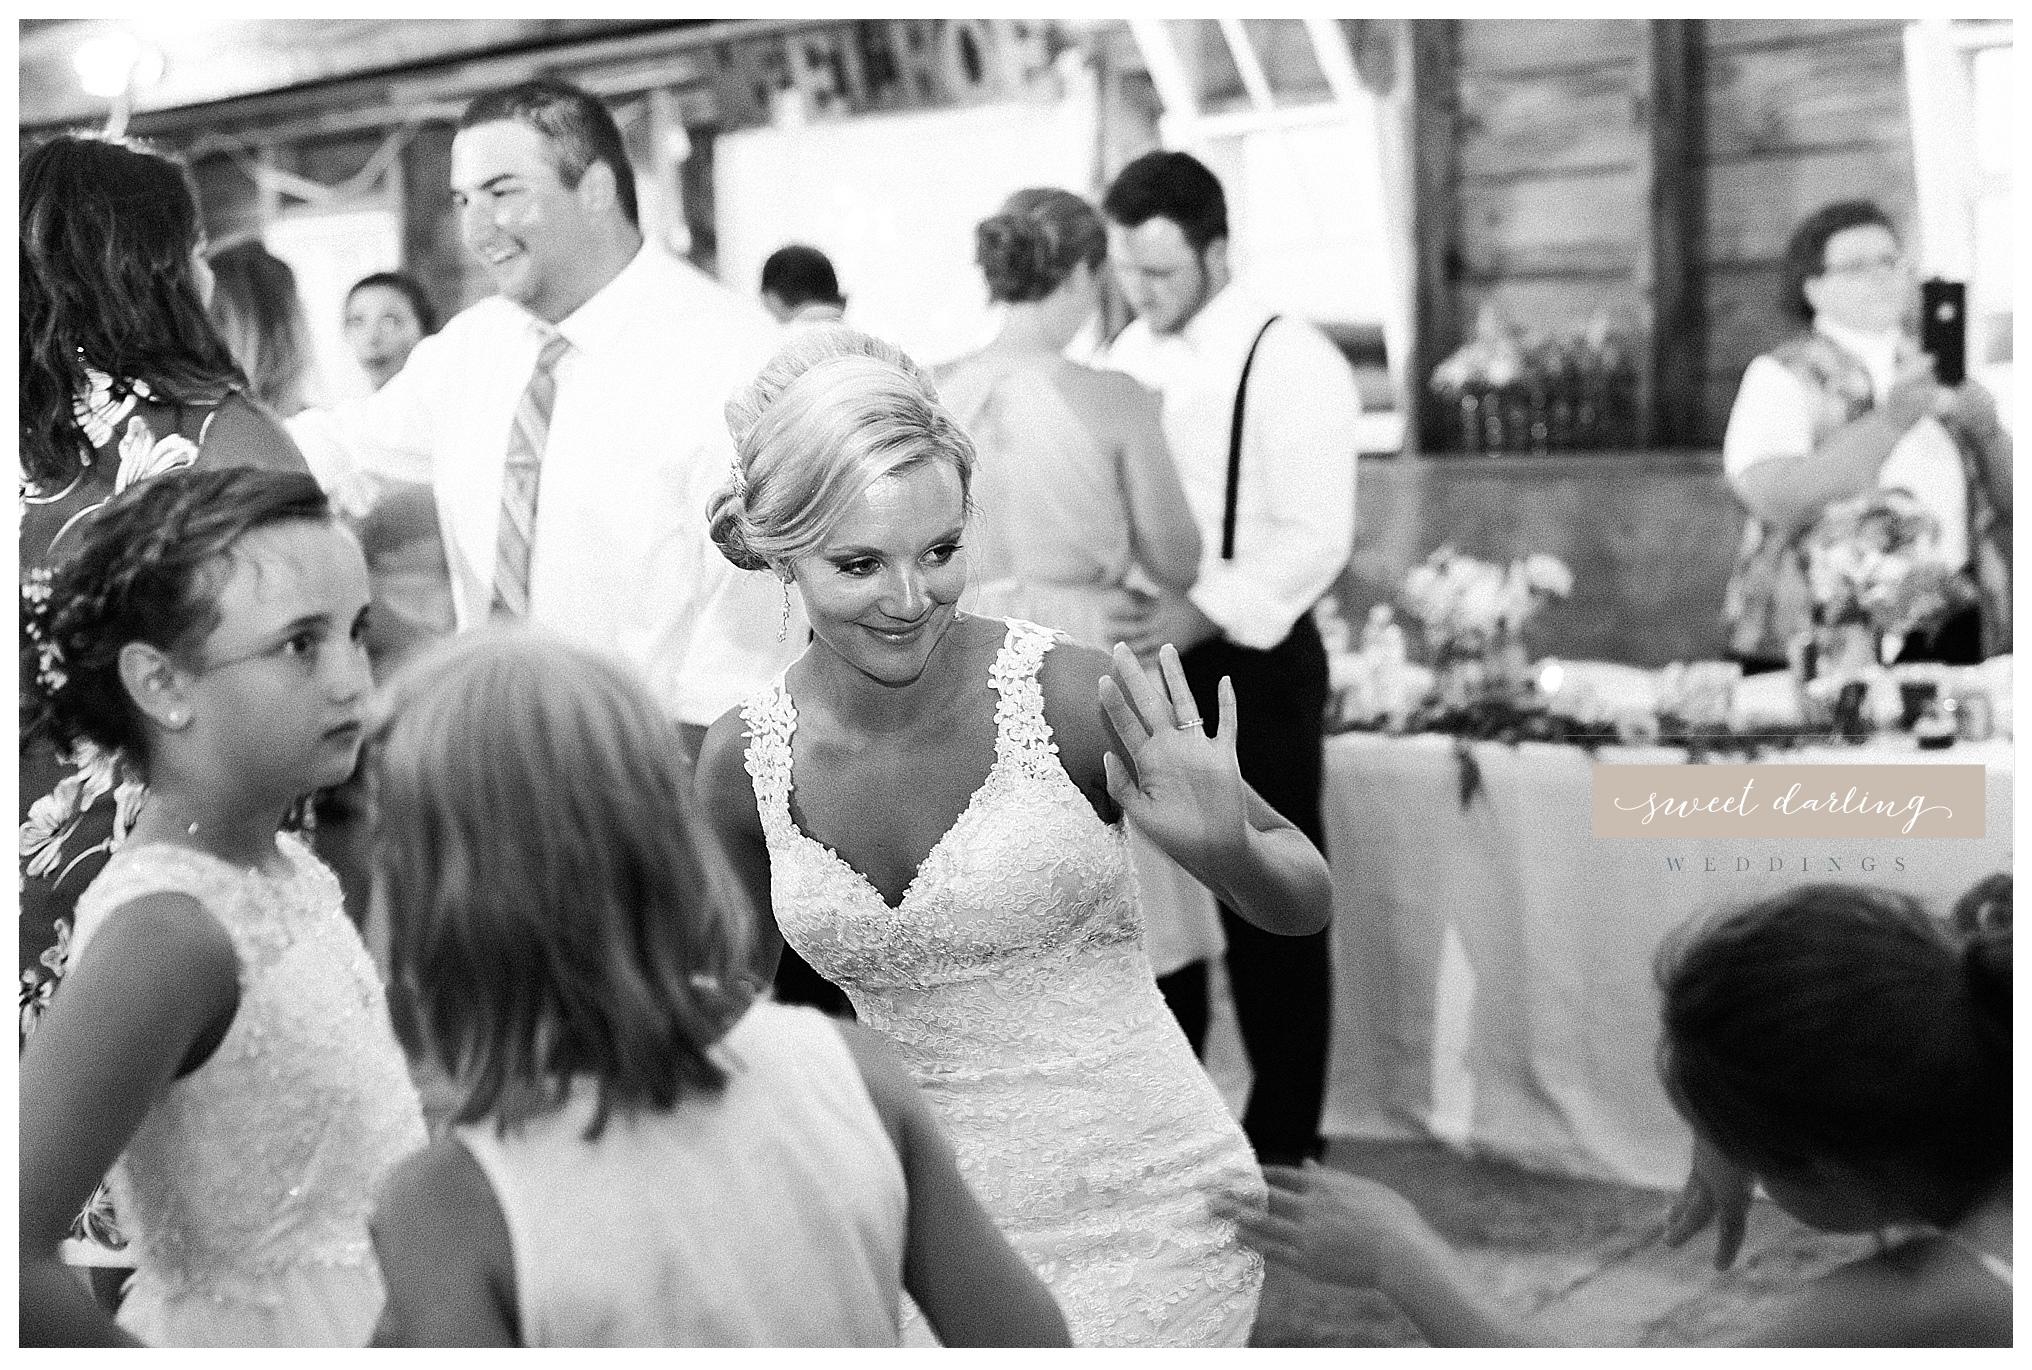 Rpaxton-illinois-engelbrecht-farm-country-wedding-photographer-sweet-darling-weddings_1268.jpg